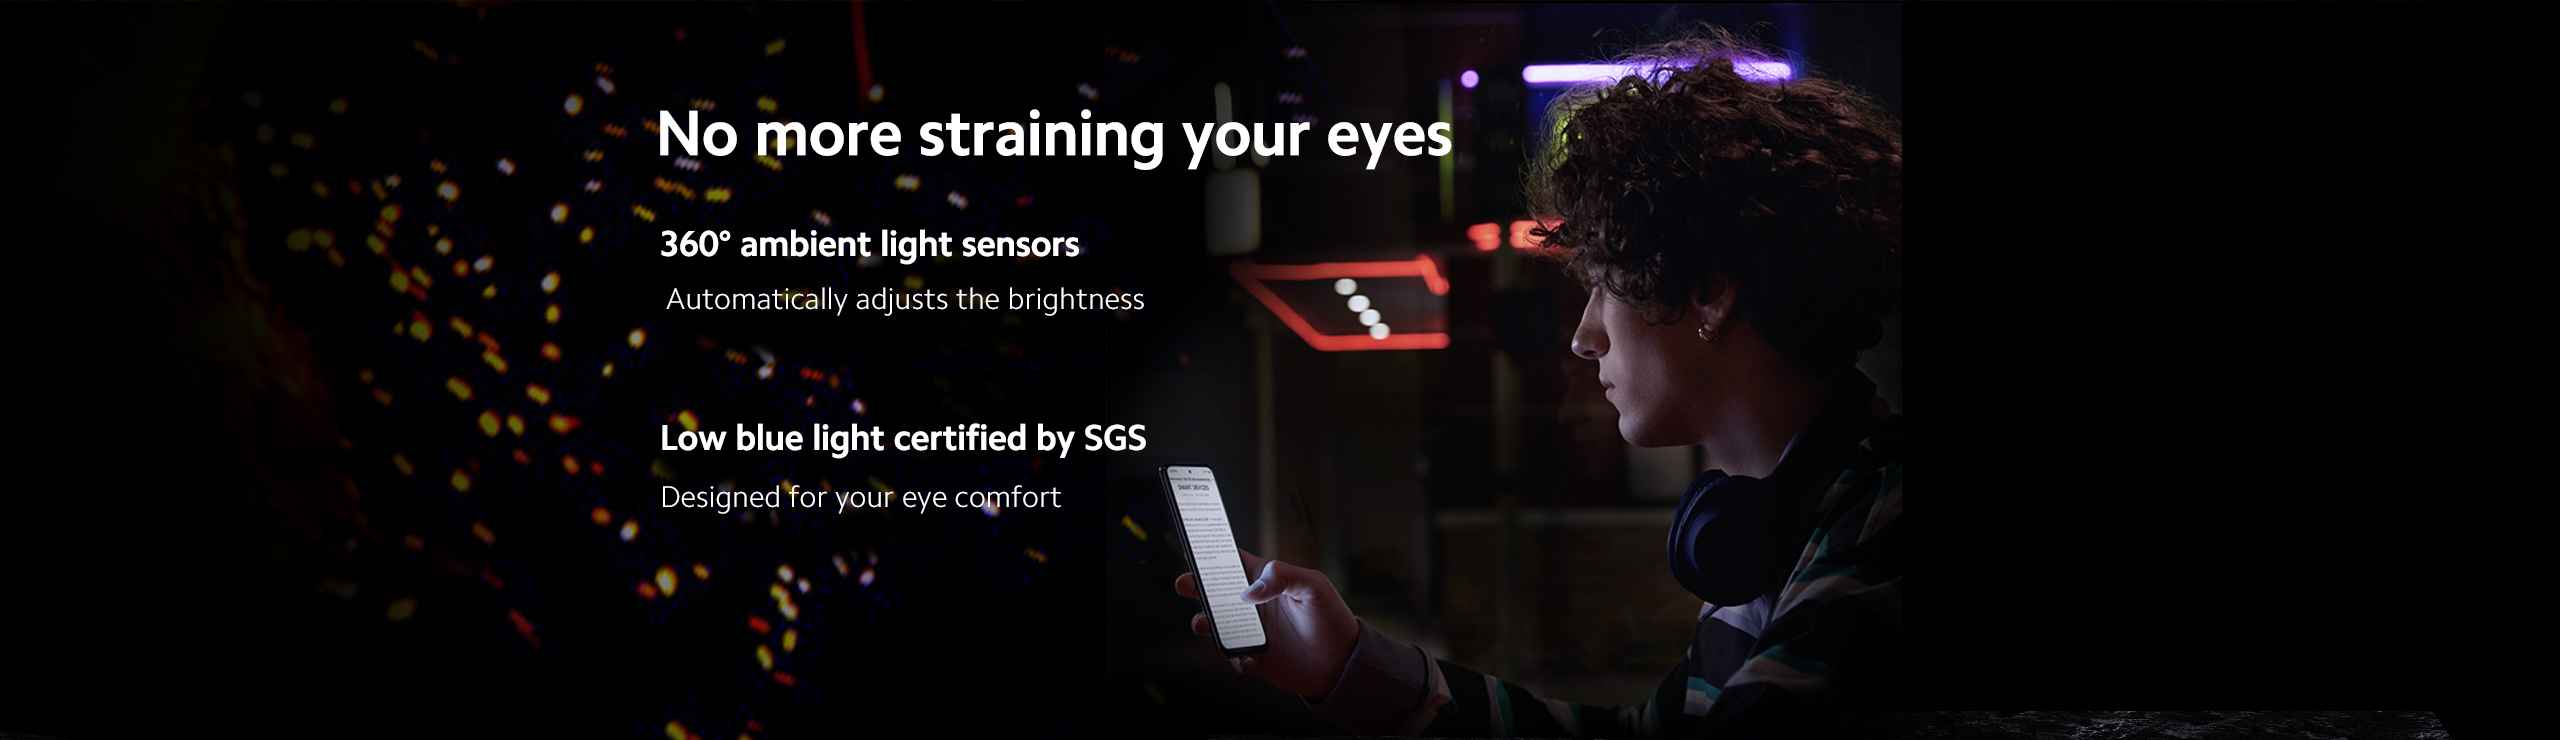 Redmi Note 10s eye comfort